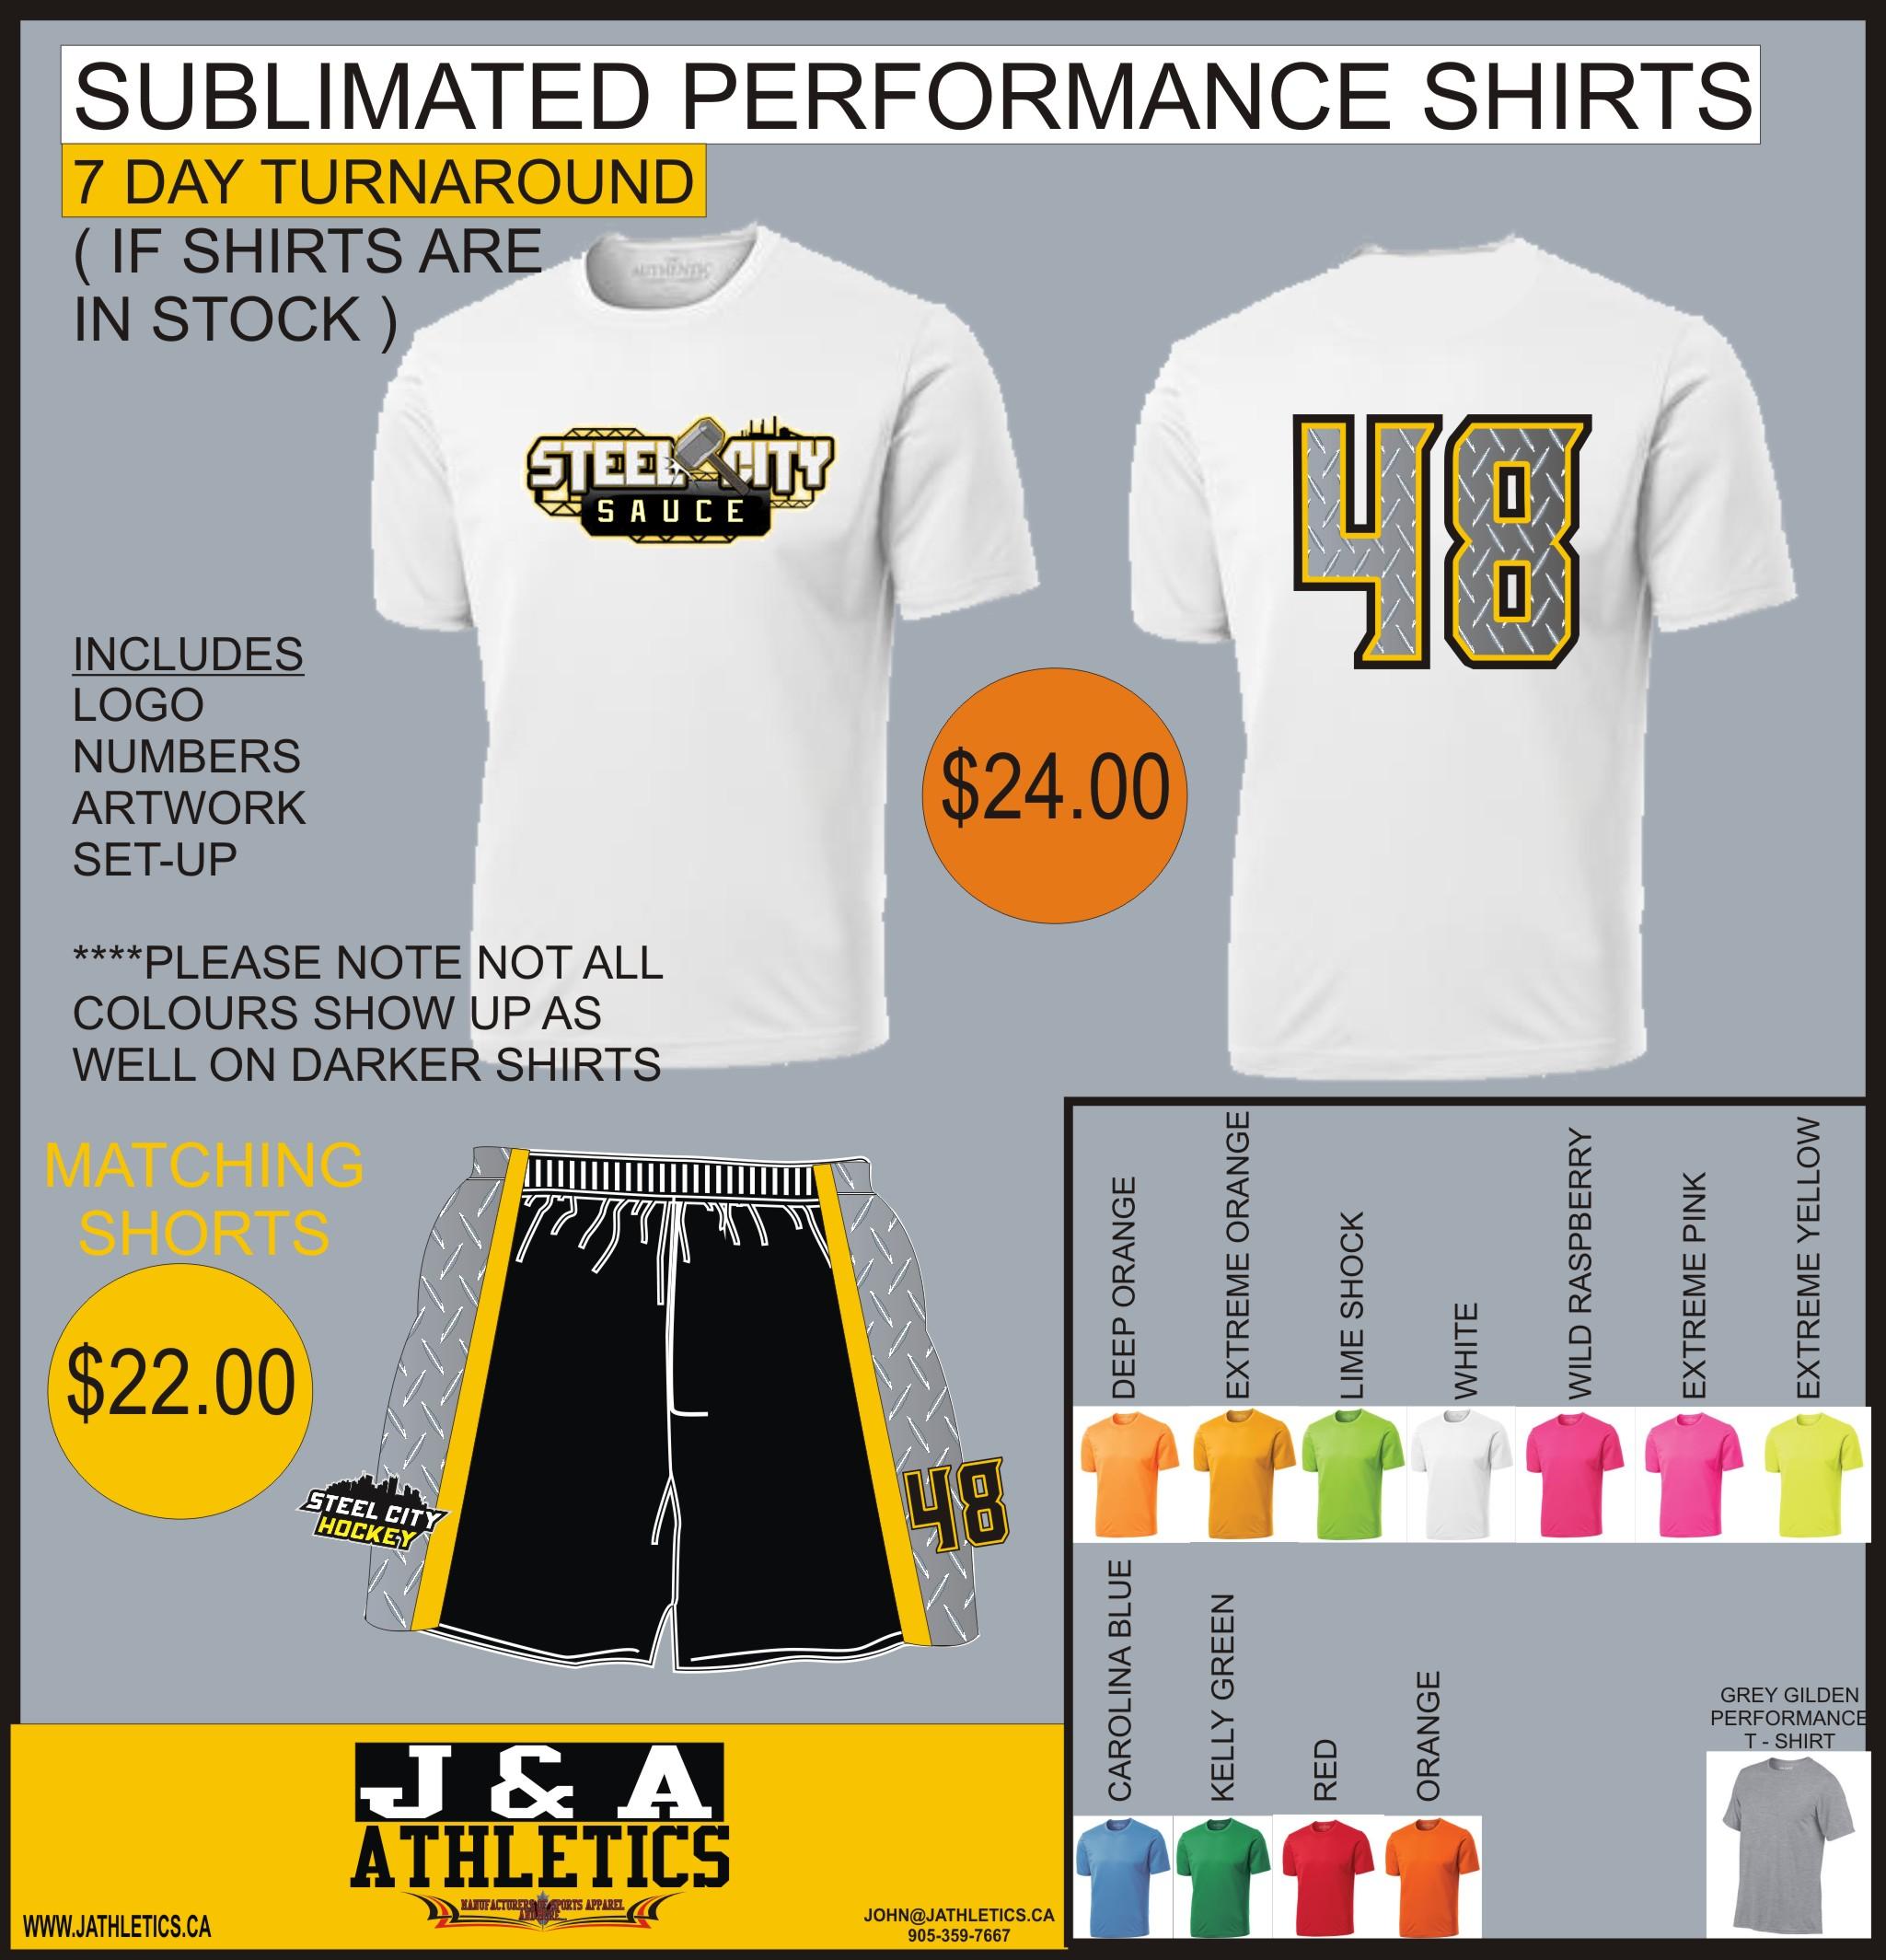 ball hockey performance shirts 561a9026dc9